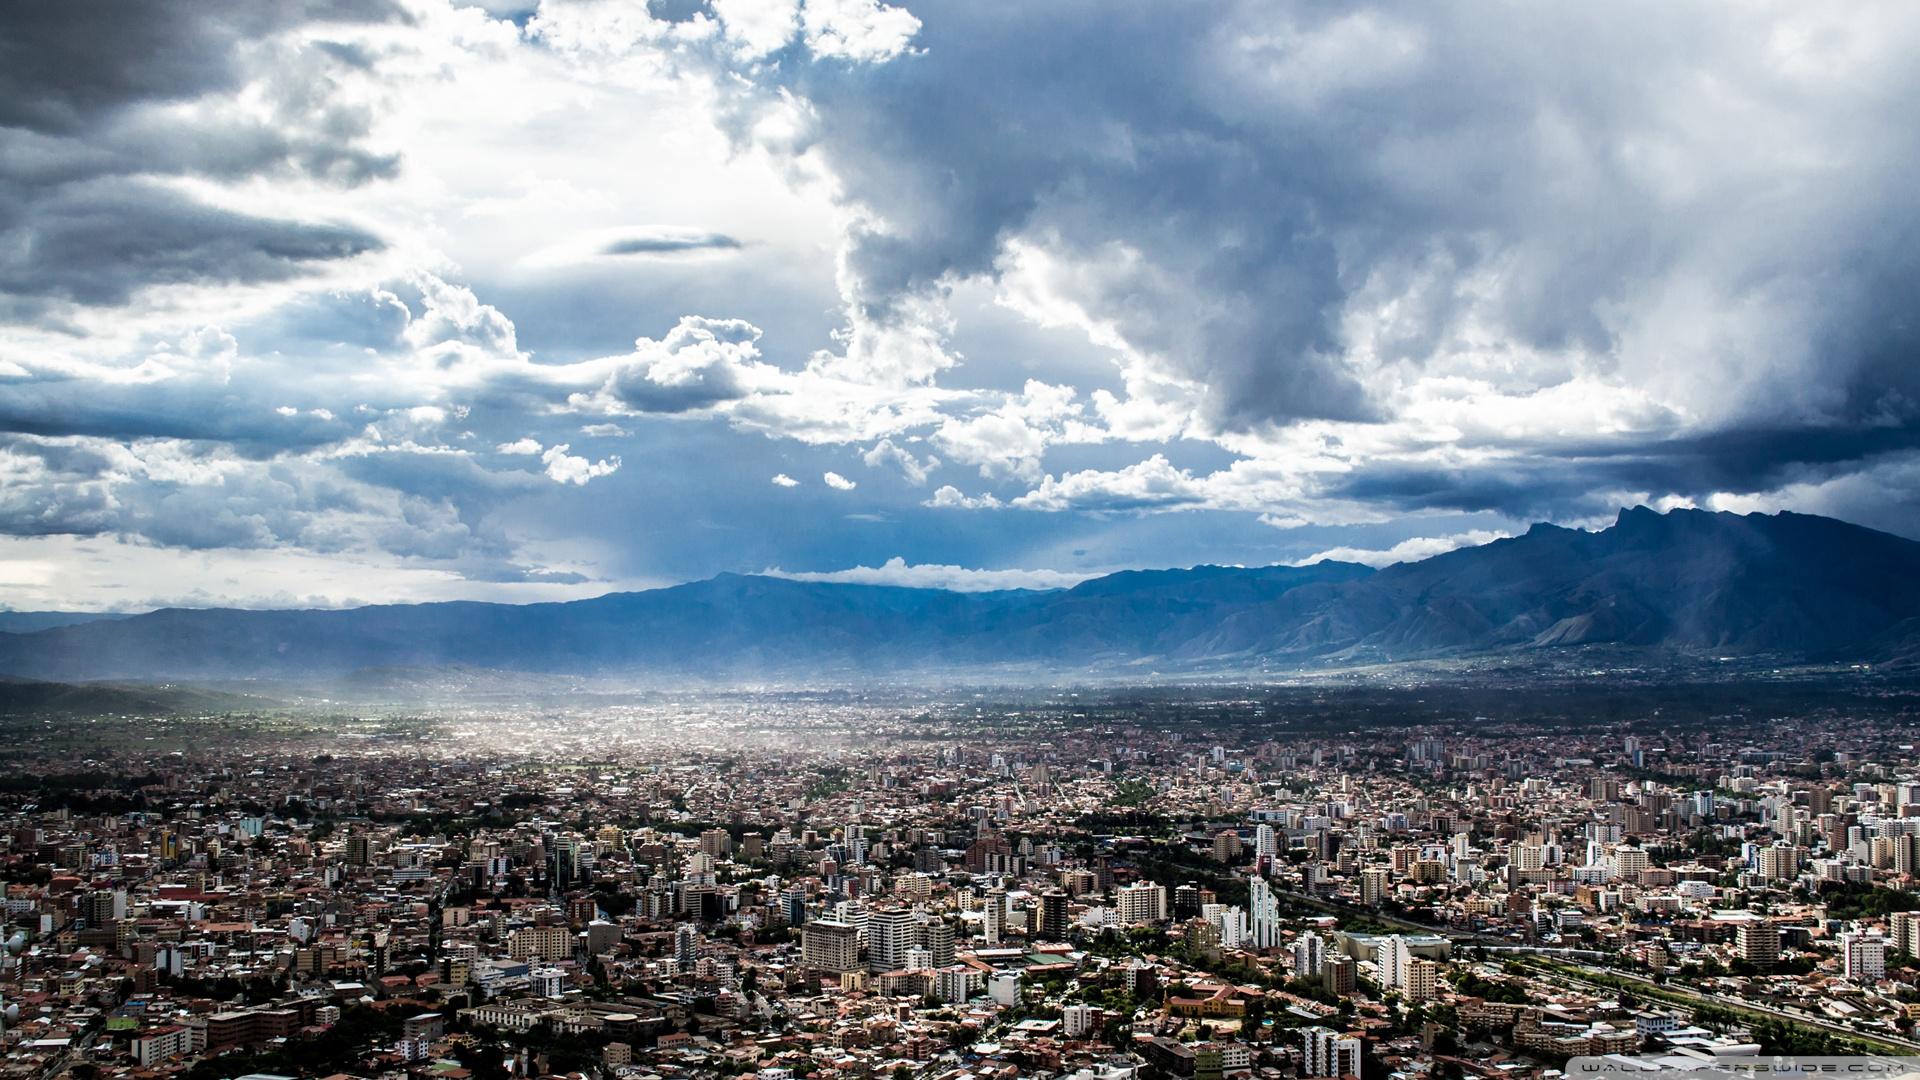 Ciudad de Cochabamba Bolivia HD 4K HD Desktop Wallpaper for 4K 1920x1080